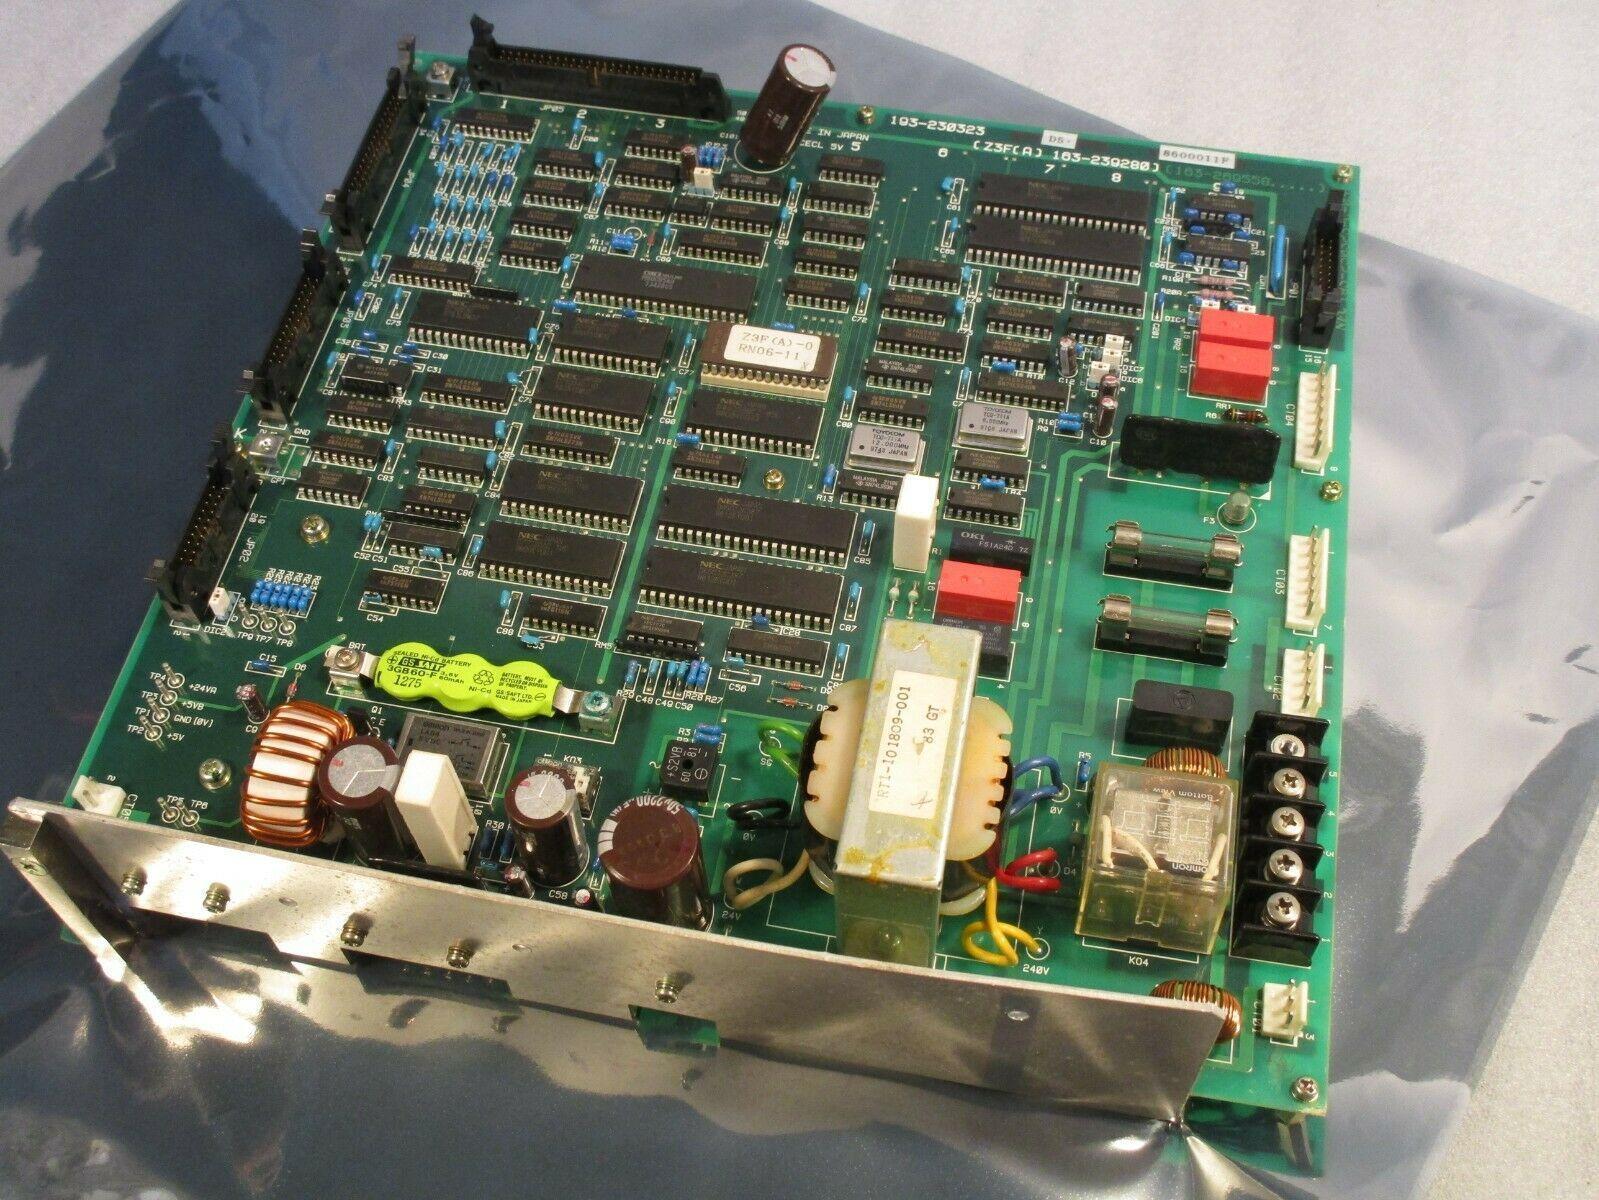 NEC Board VACAAX 193-250323